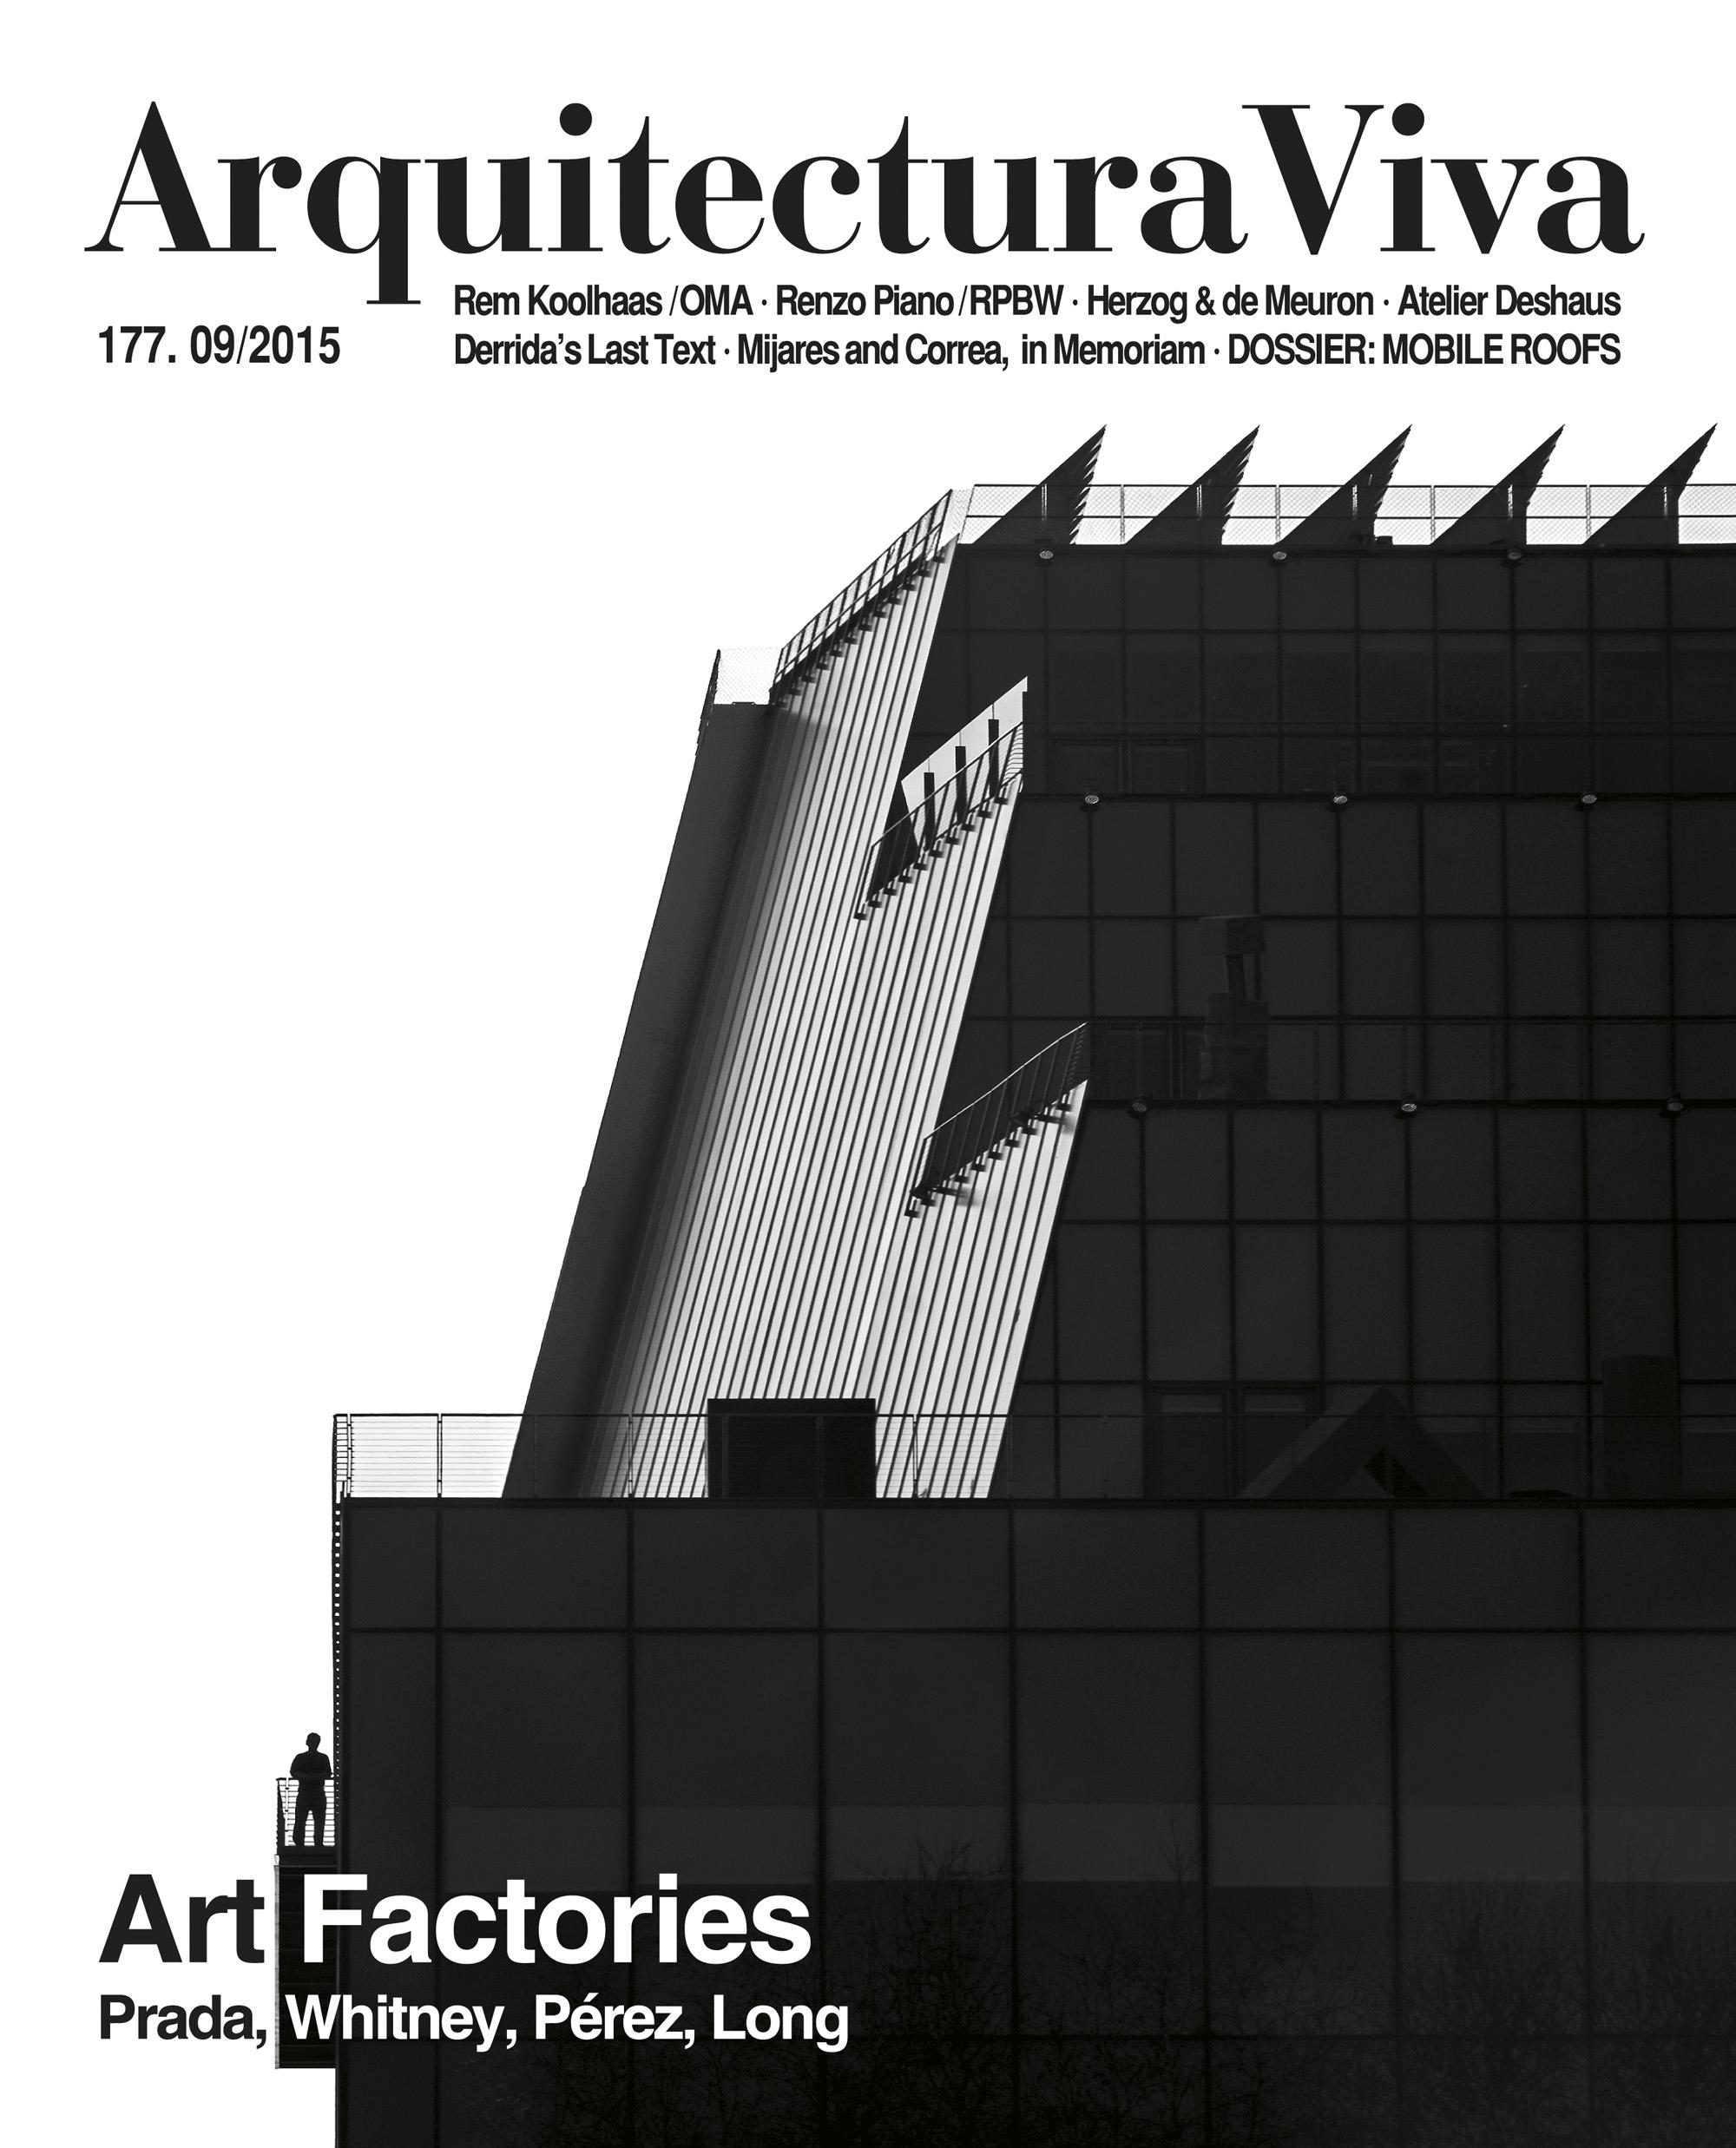 Art Factories